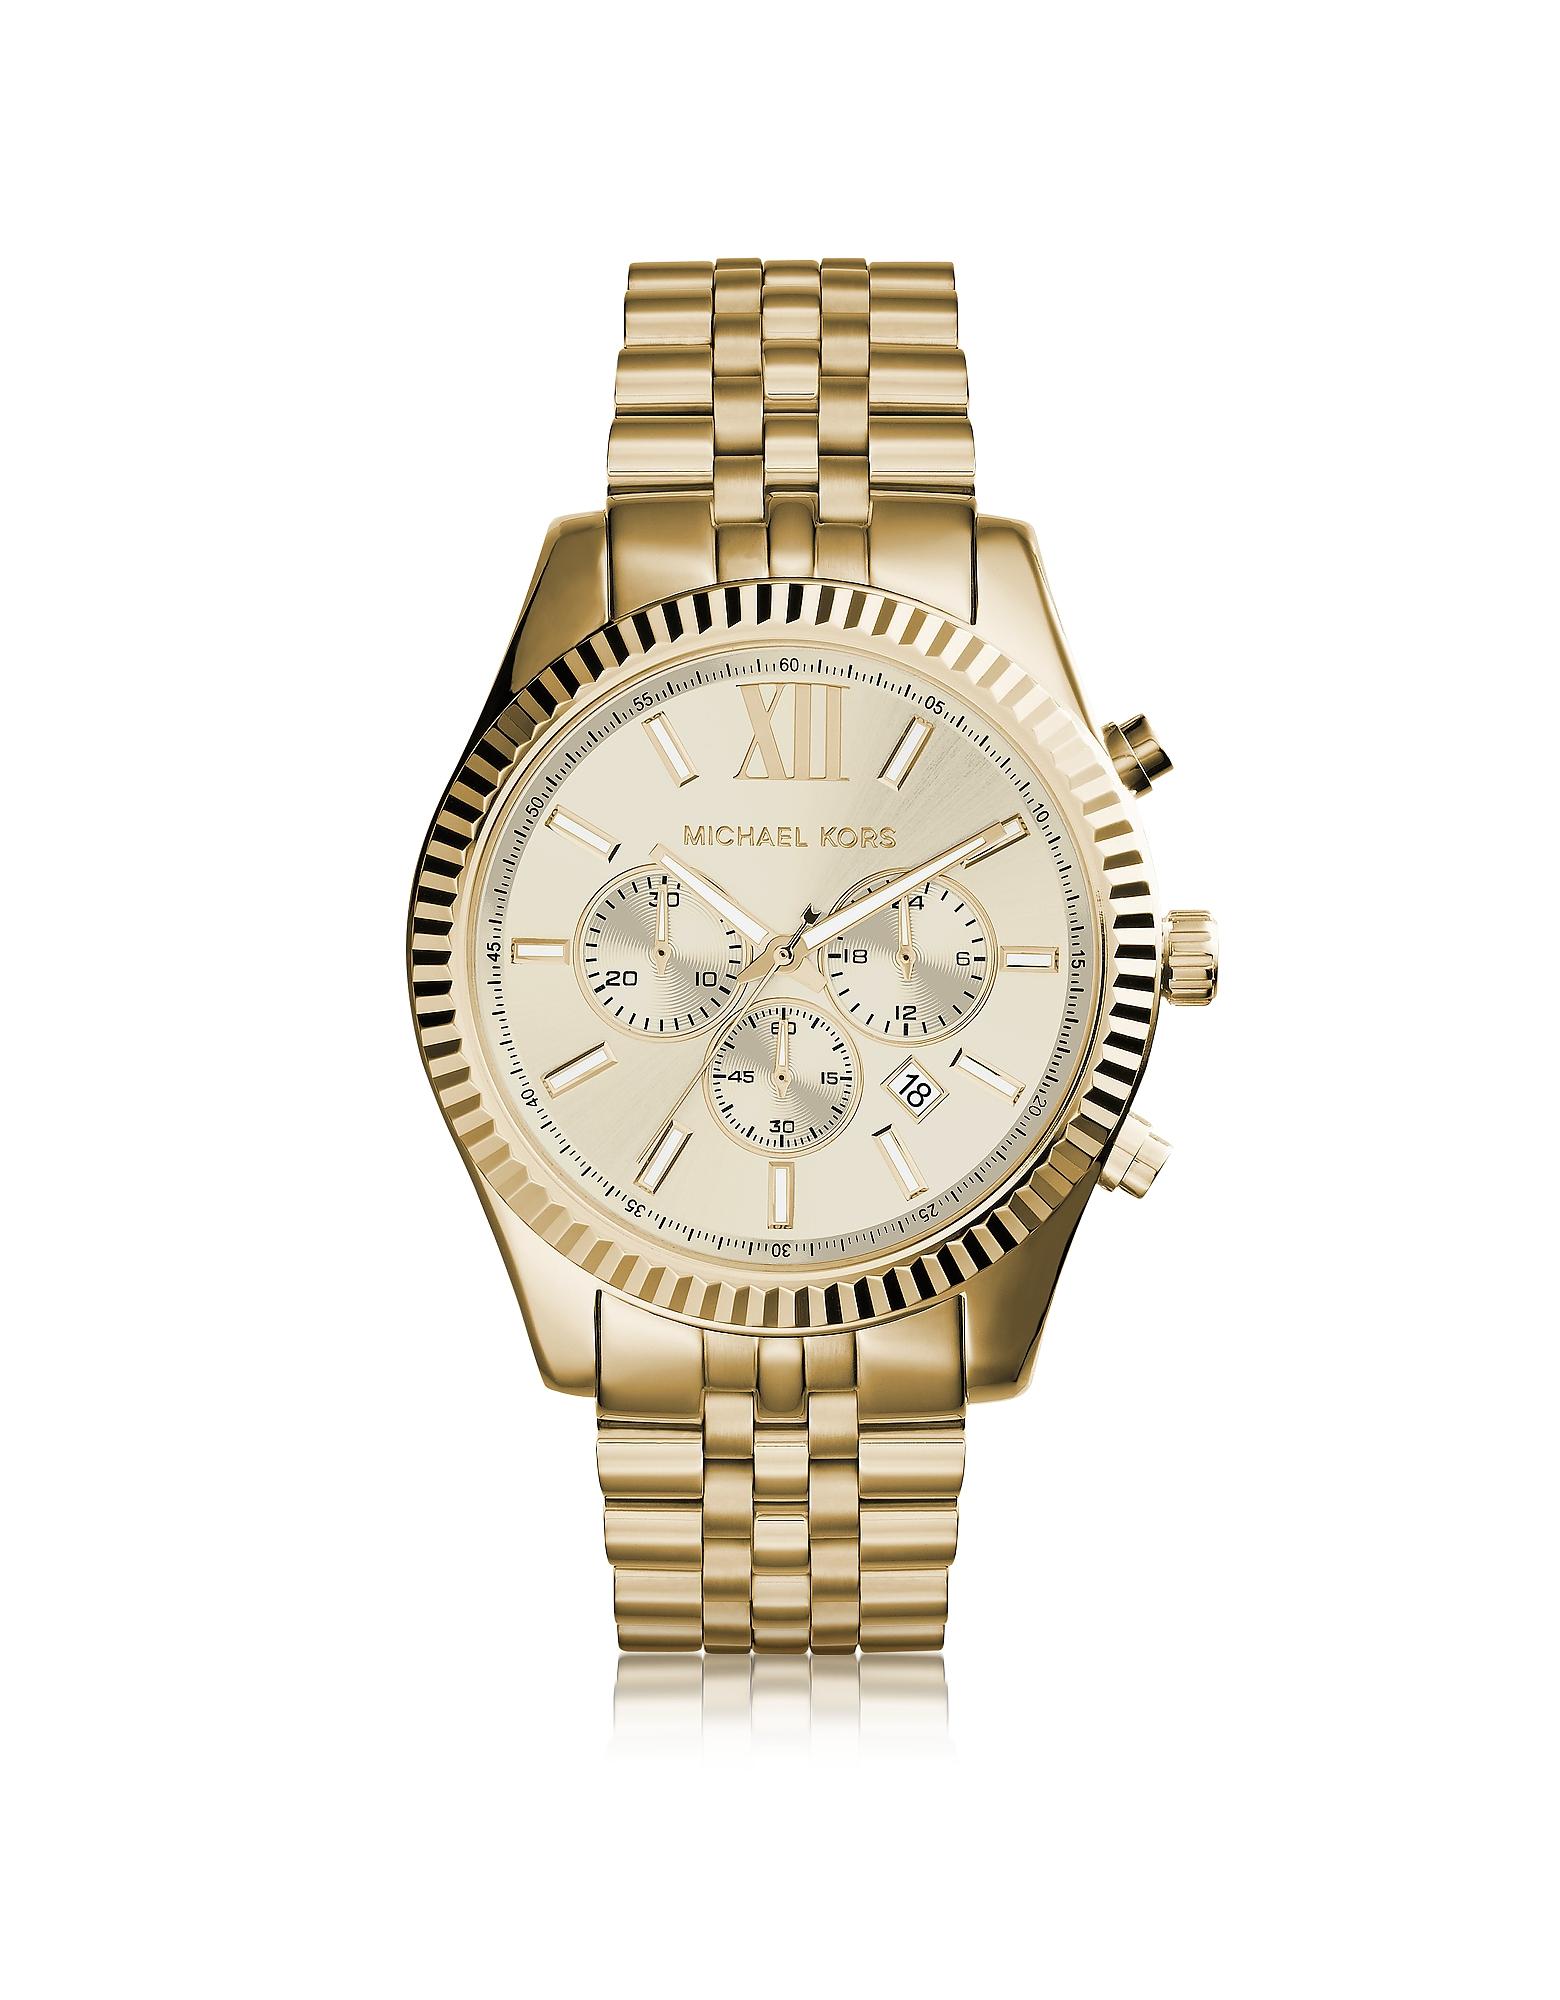 Michael Kors Men's Watches, Lexington Gold Tone Stainless Steel Men's Chrono Watch